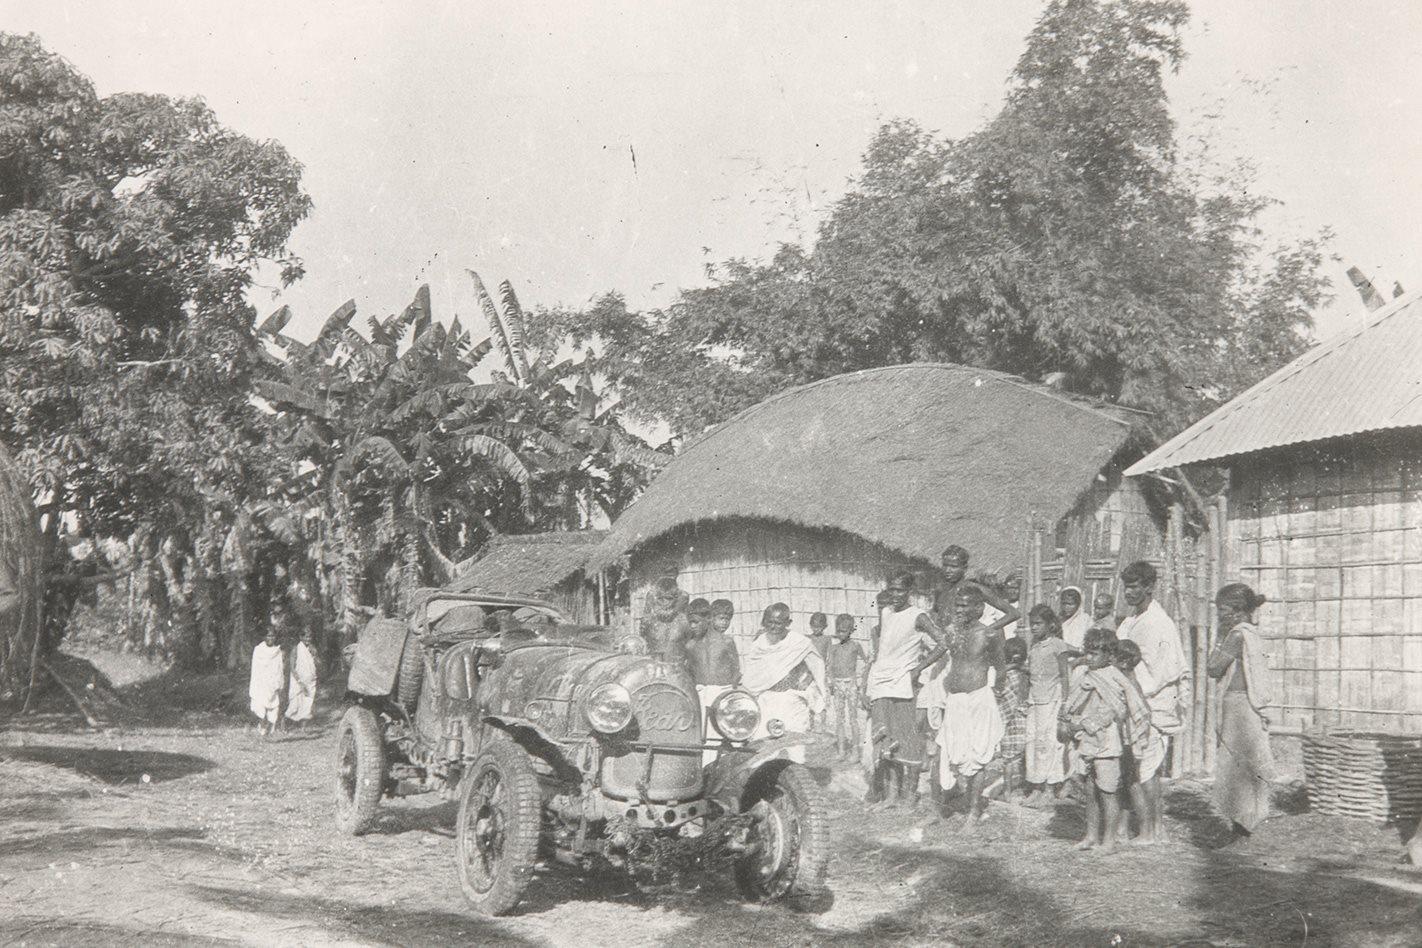 The-Bean-&-Burmese-village.jpg